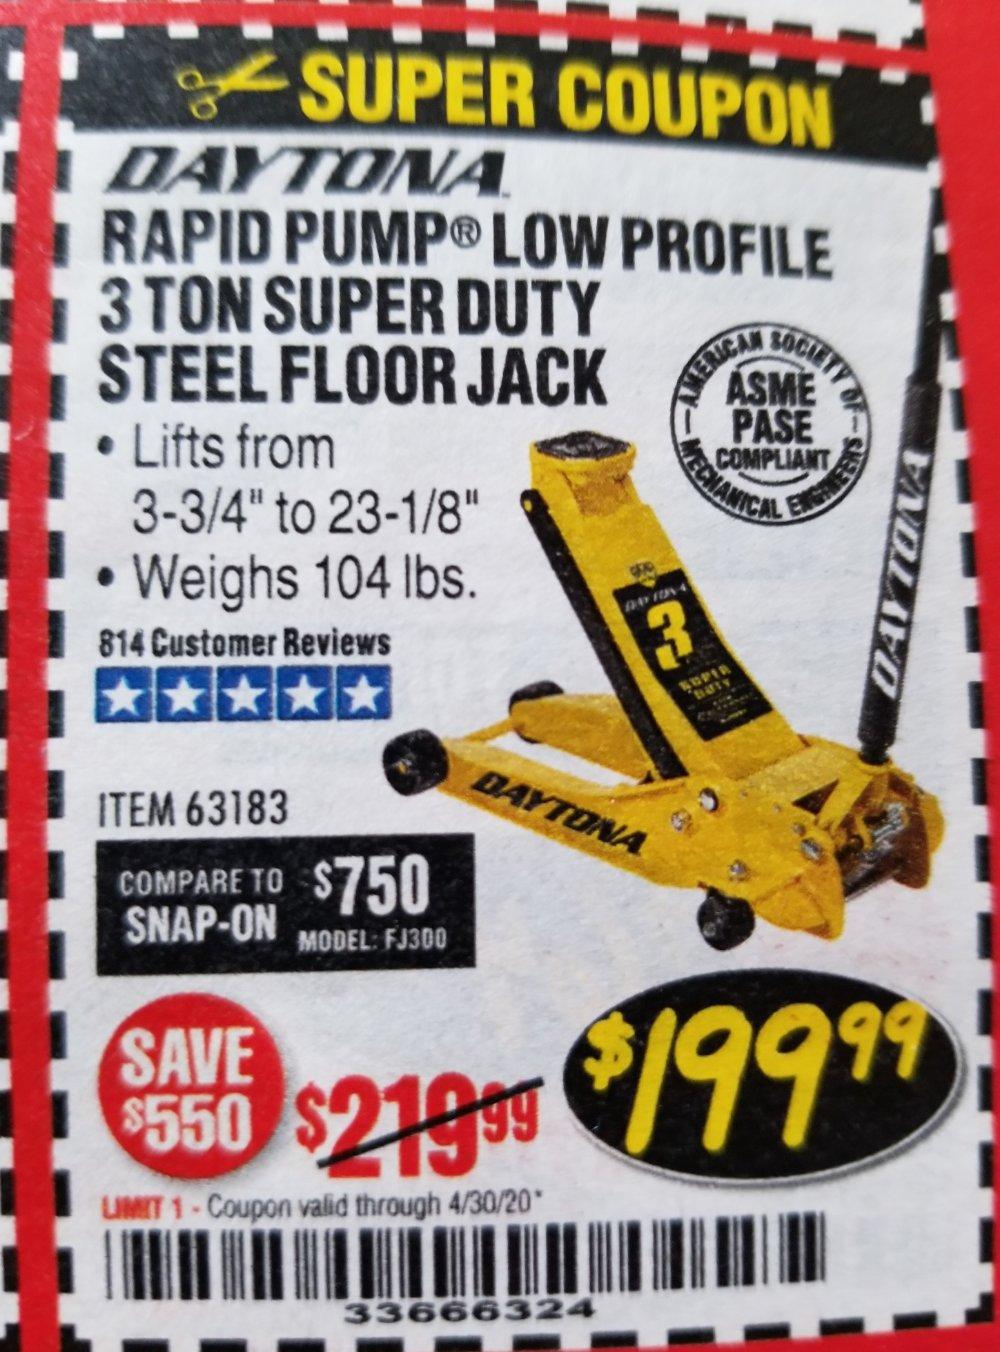 Harbor Freight Coupon, HF Coupons - 3 Ton Daytona Professional Steel Floor Jack - Super Duty